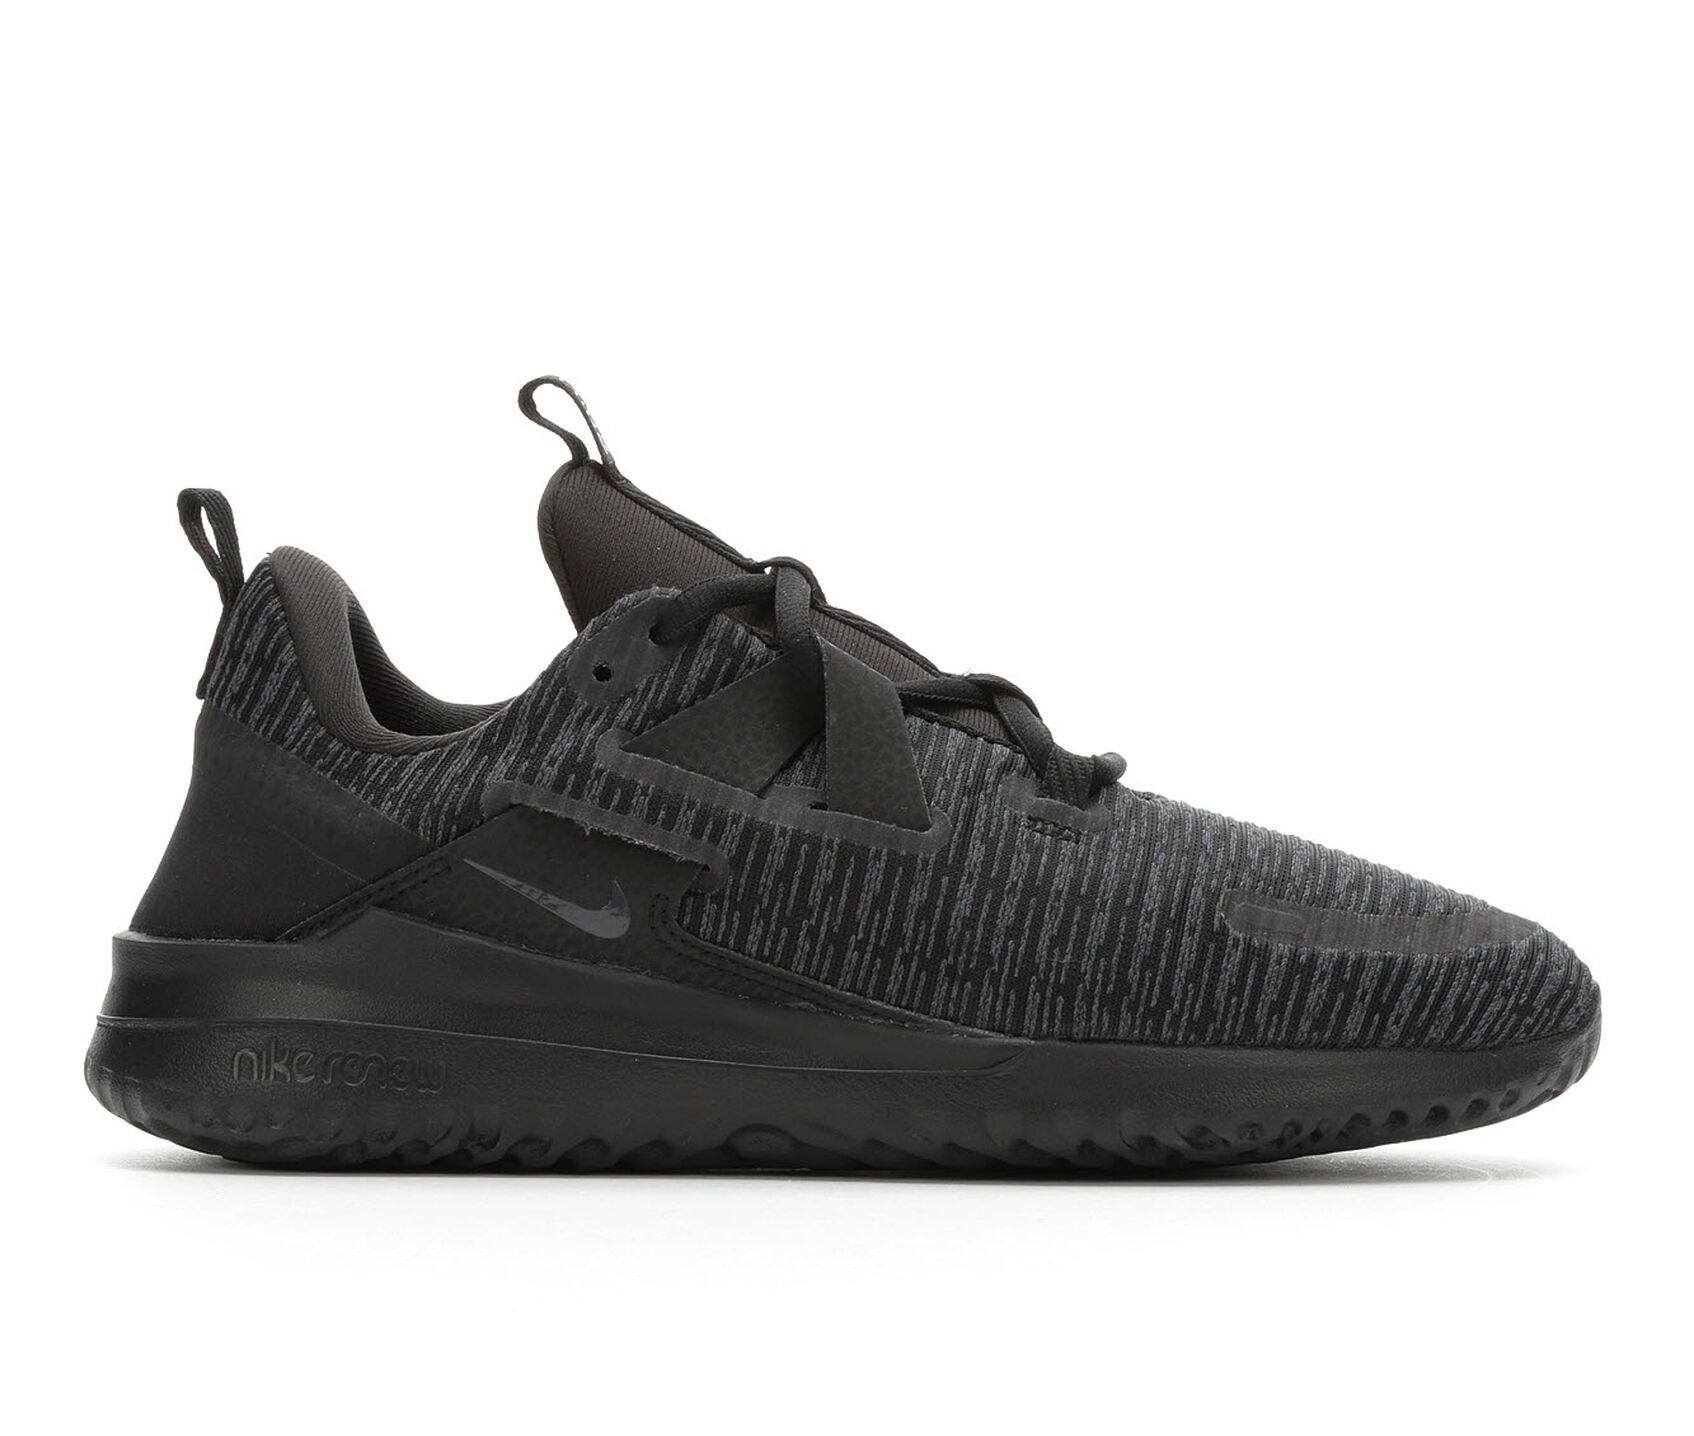 8cb9e722eb Women's Nike Renew Arena Running Shoes